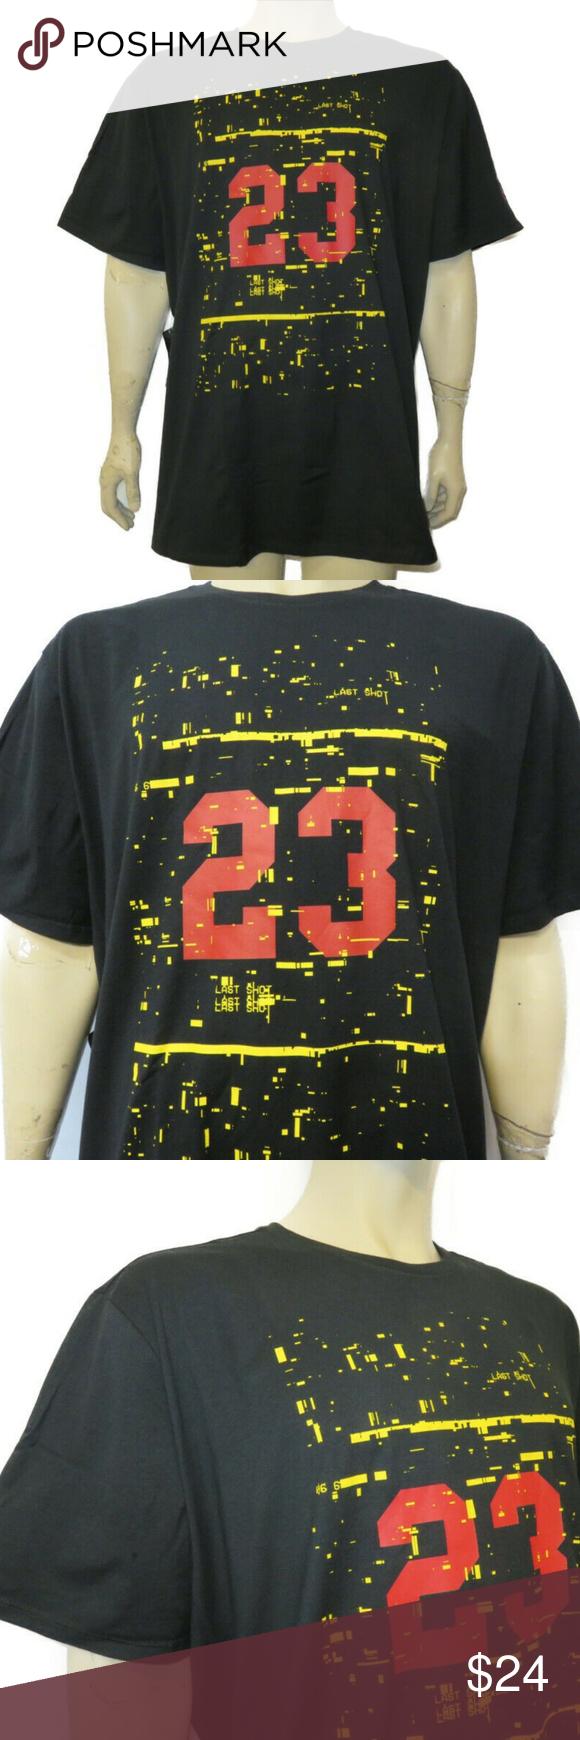 e35097c9a89 Air Jordan Last Shot Men's T-Shirt Size 3XL AO2632-010 Air Jordan Men's